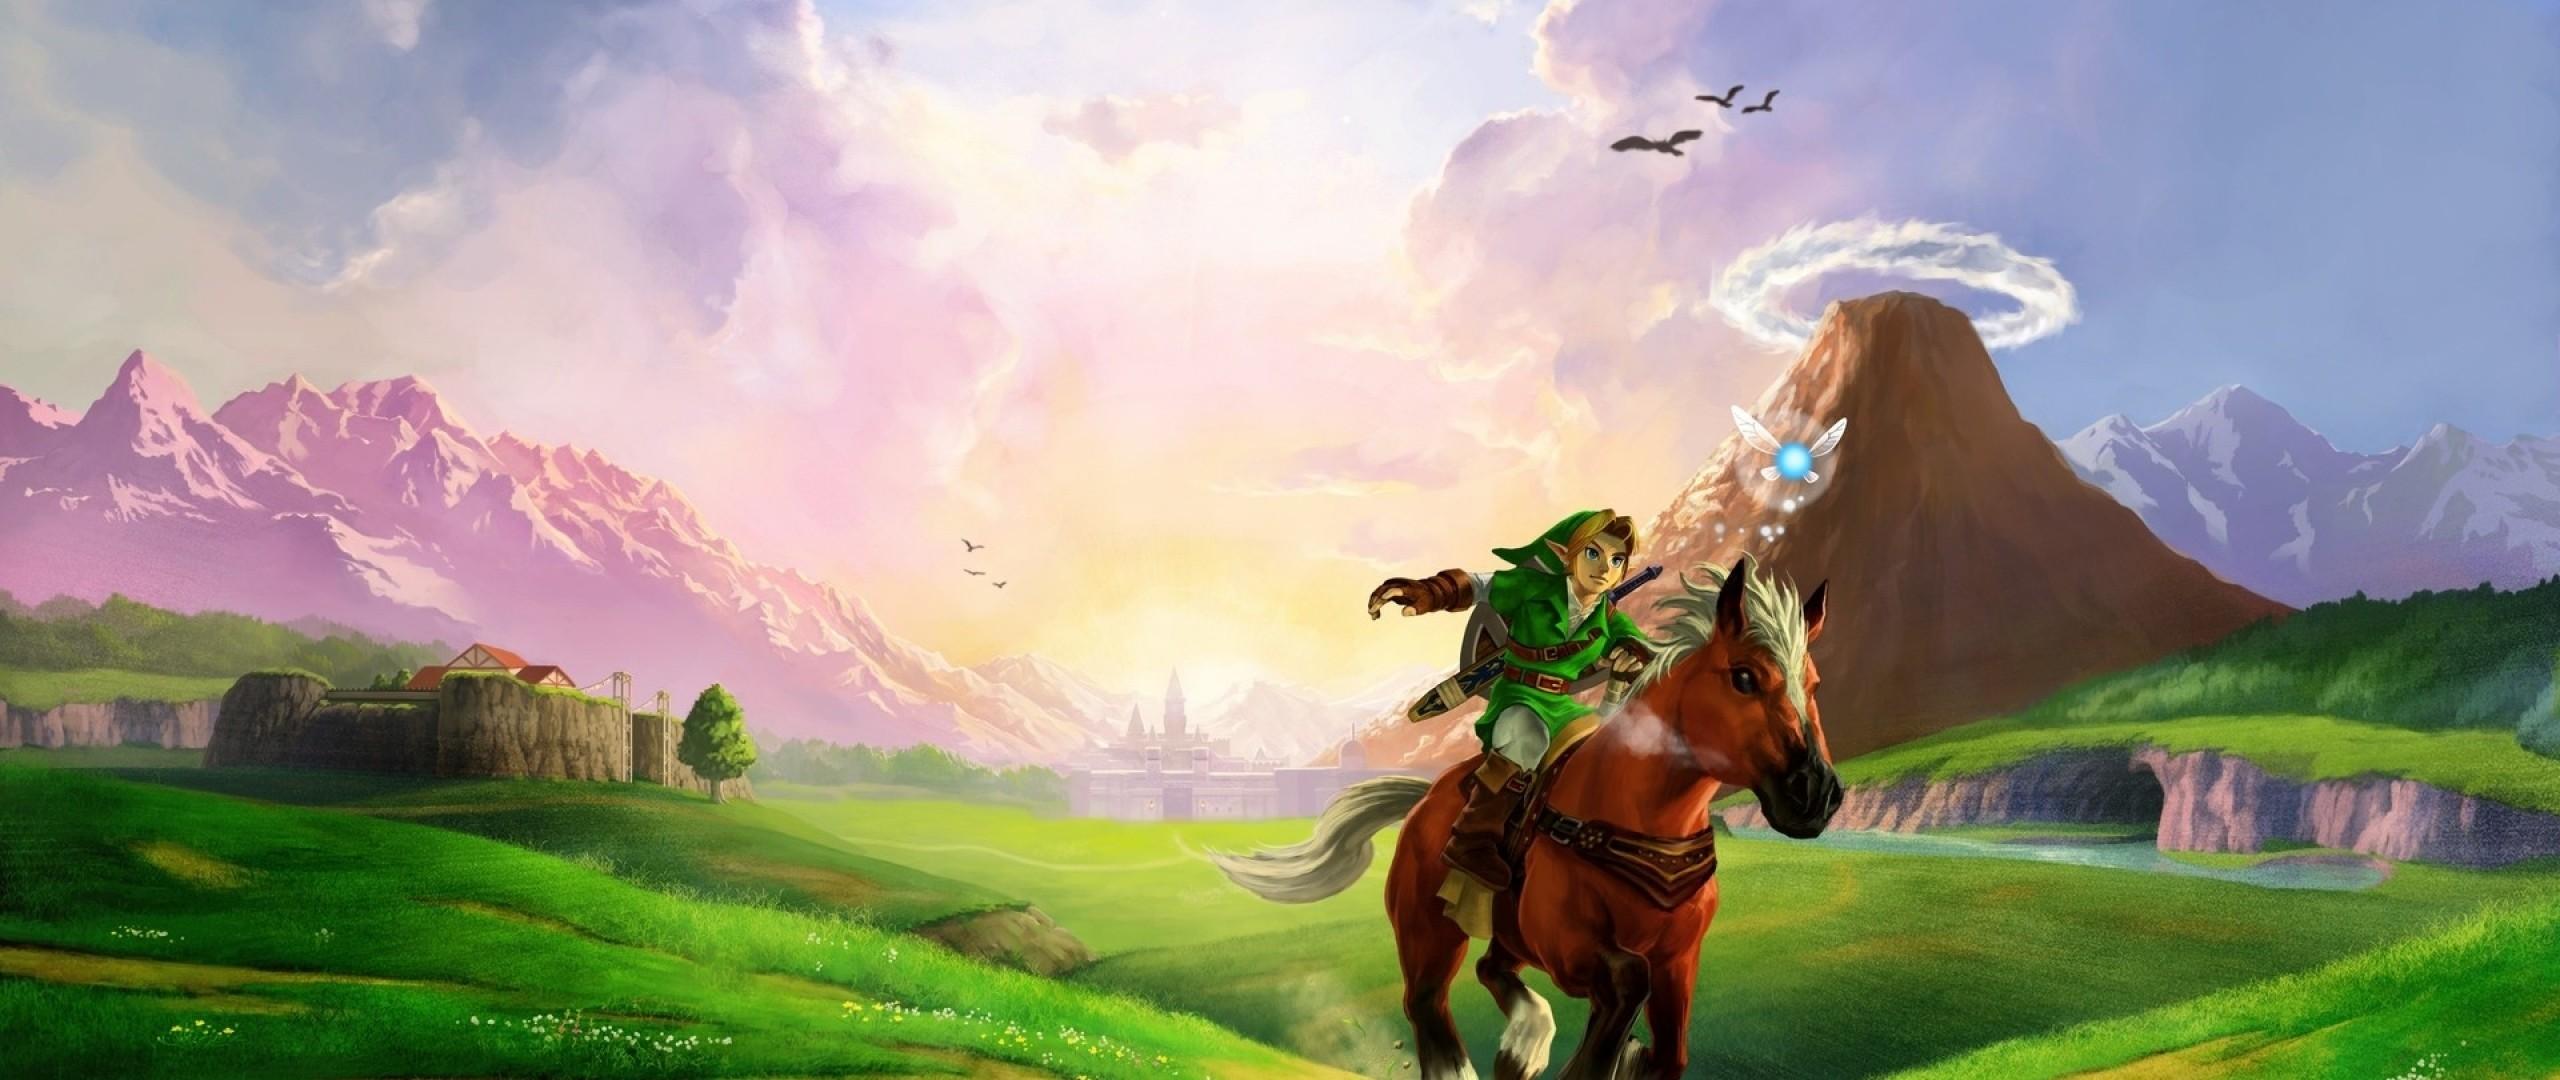 Kingdom Hearts Iphone Wallpaper Zelda Background 74 Images